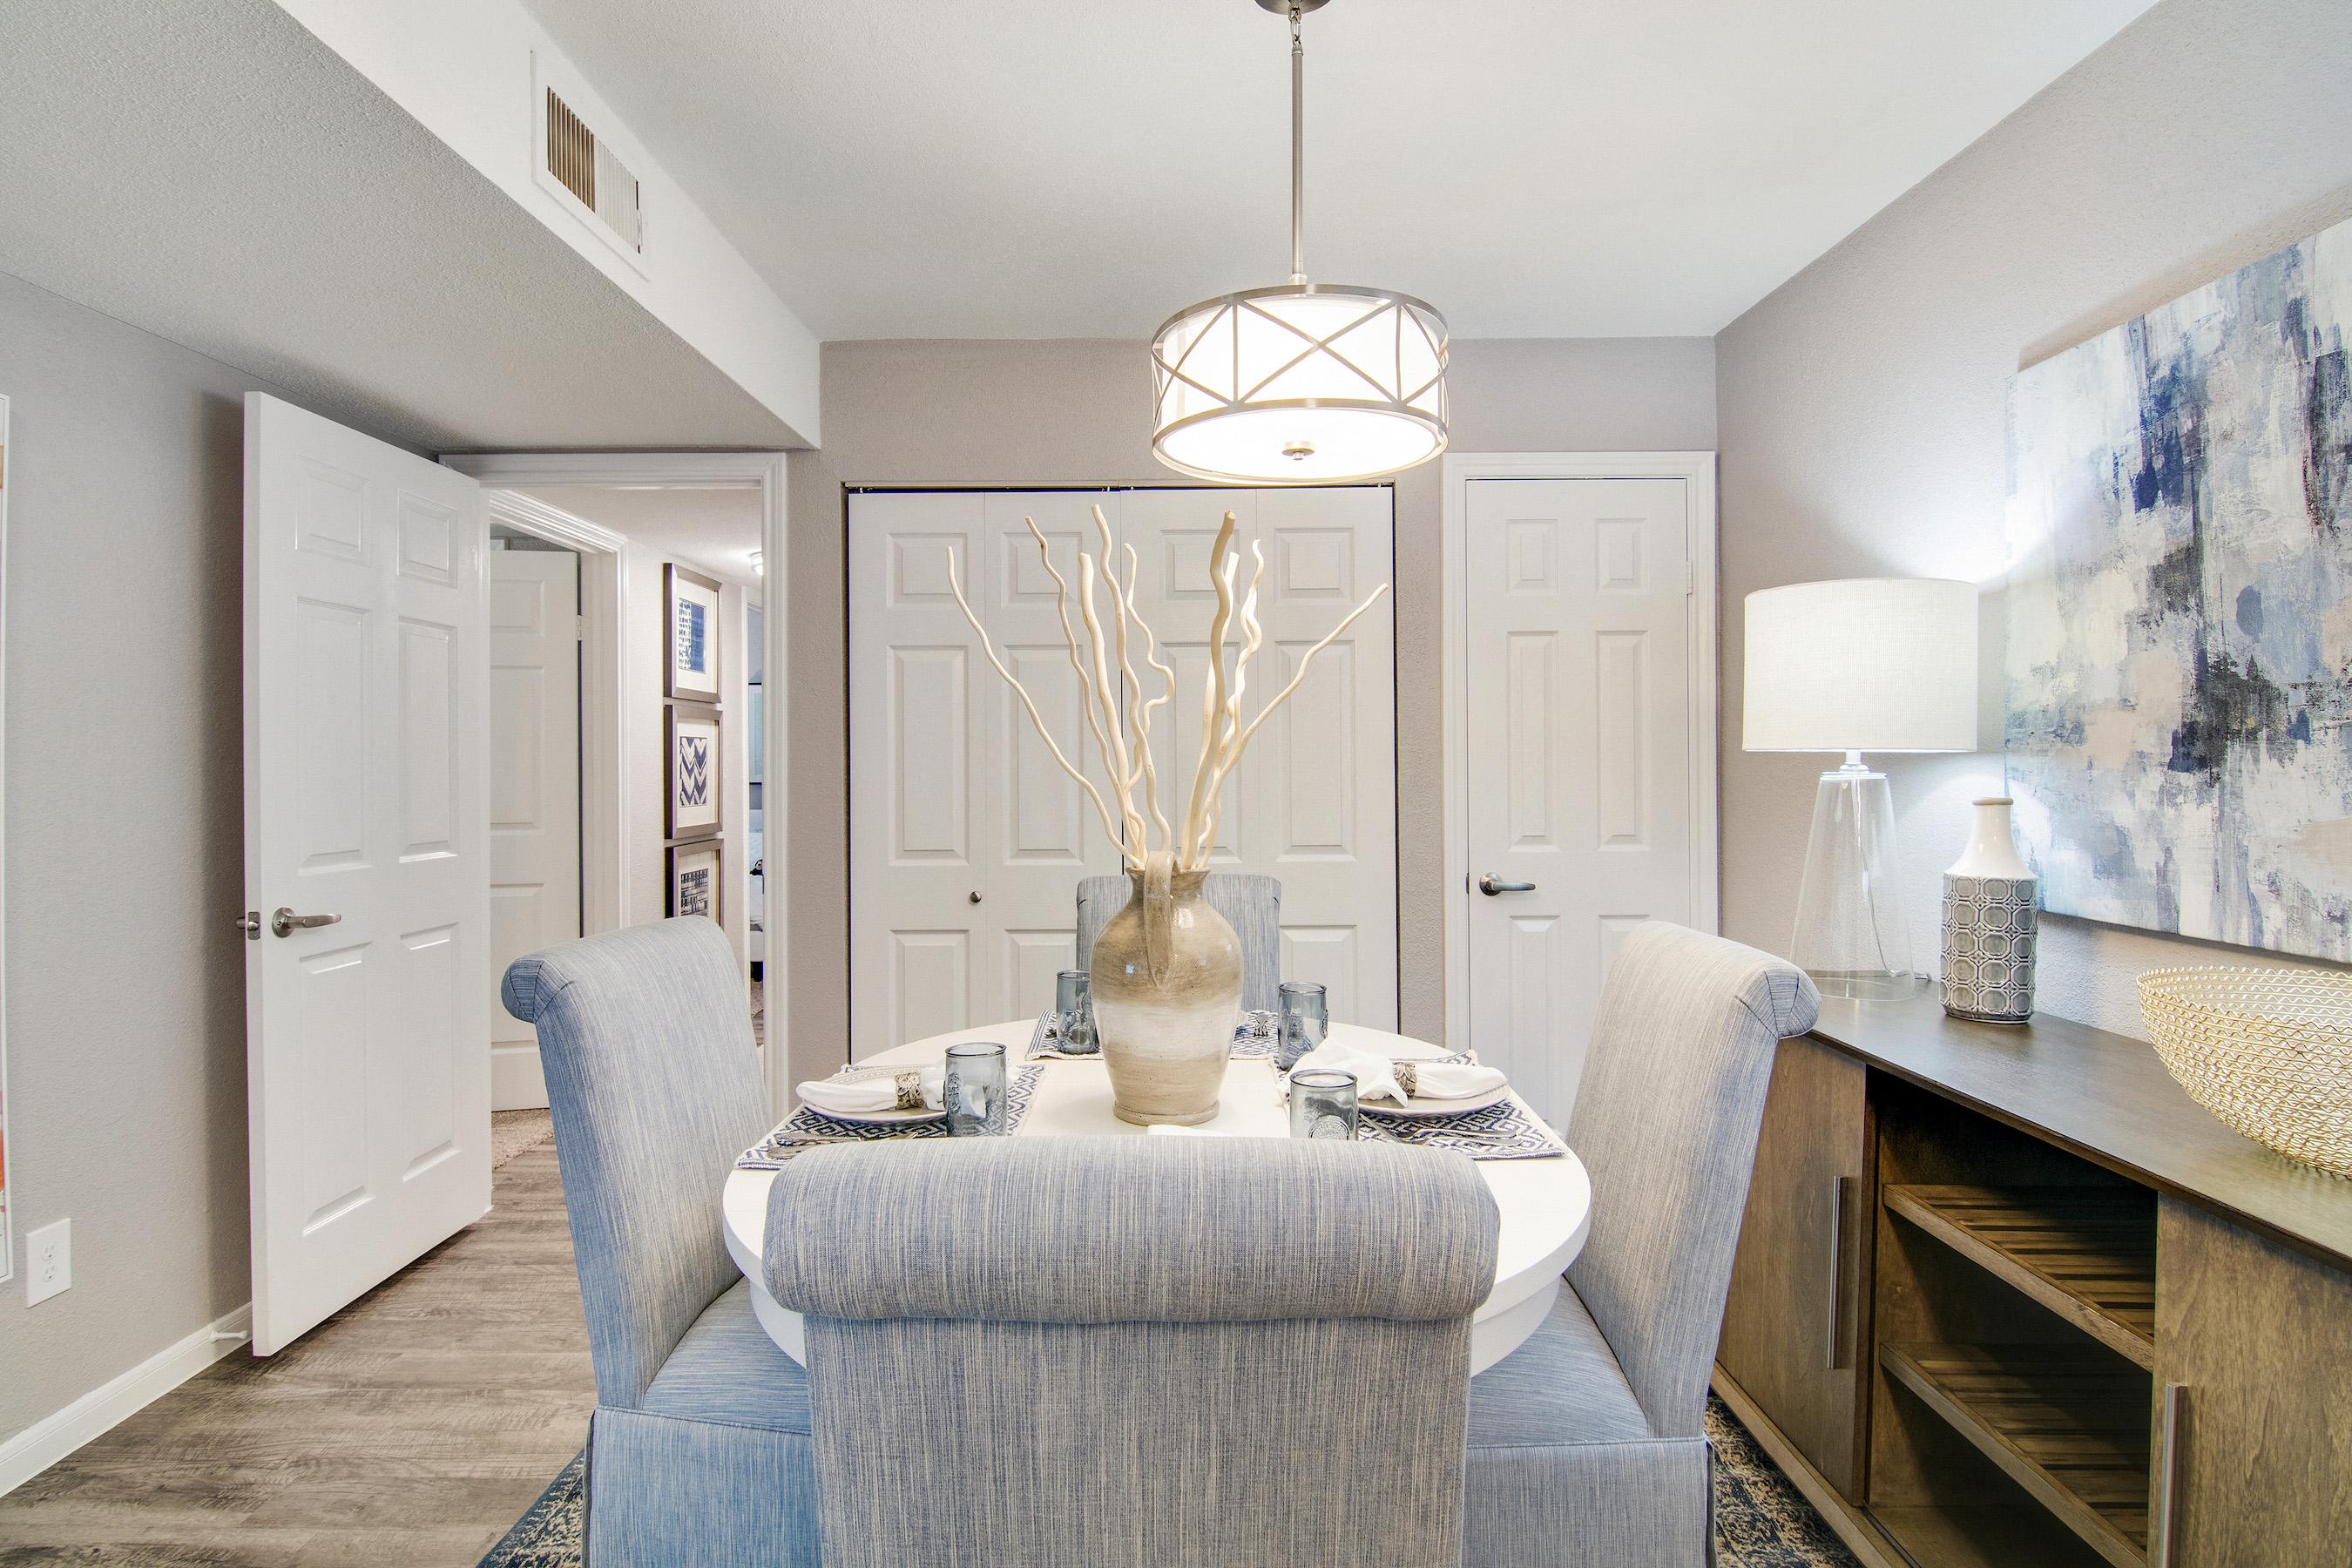 1 bedroom apartments for rent in houston tx 1 693 rentals rentcaf rh rentcafe com